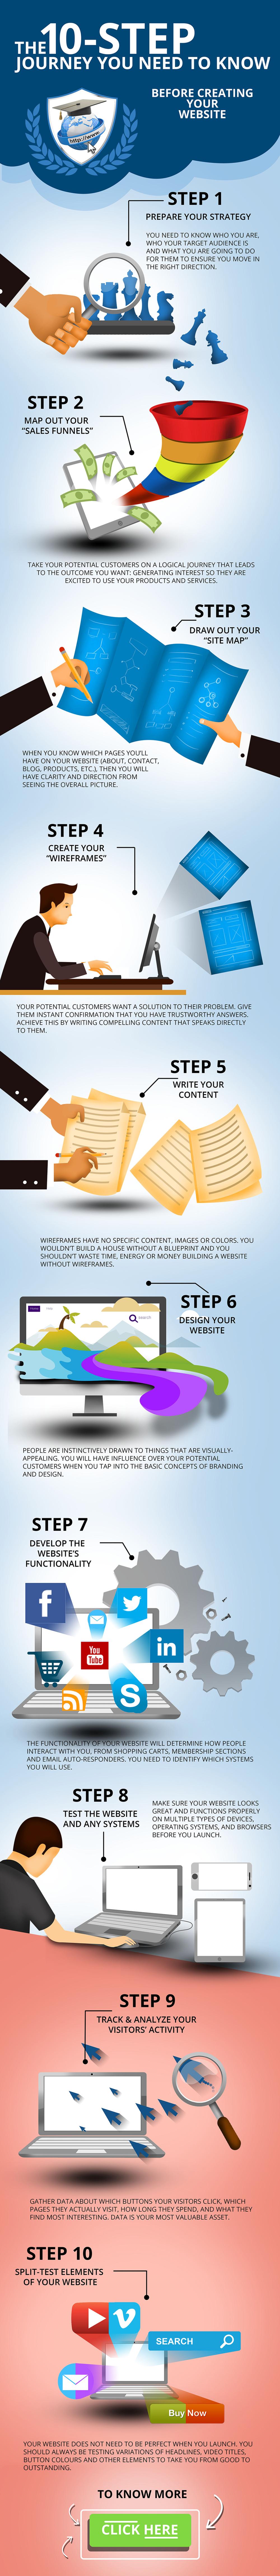 10 Steps to Remember for More Effective Website Design